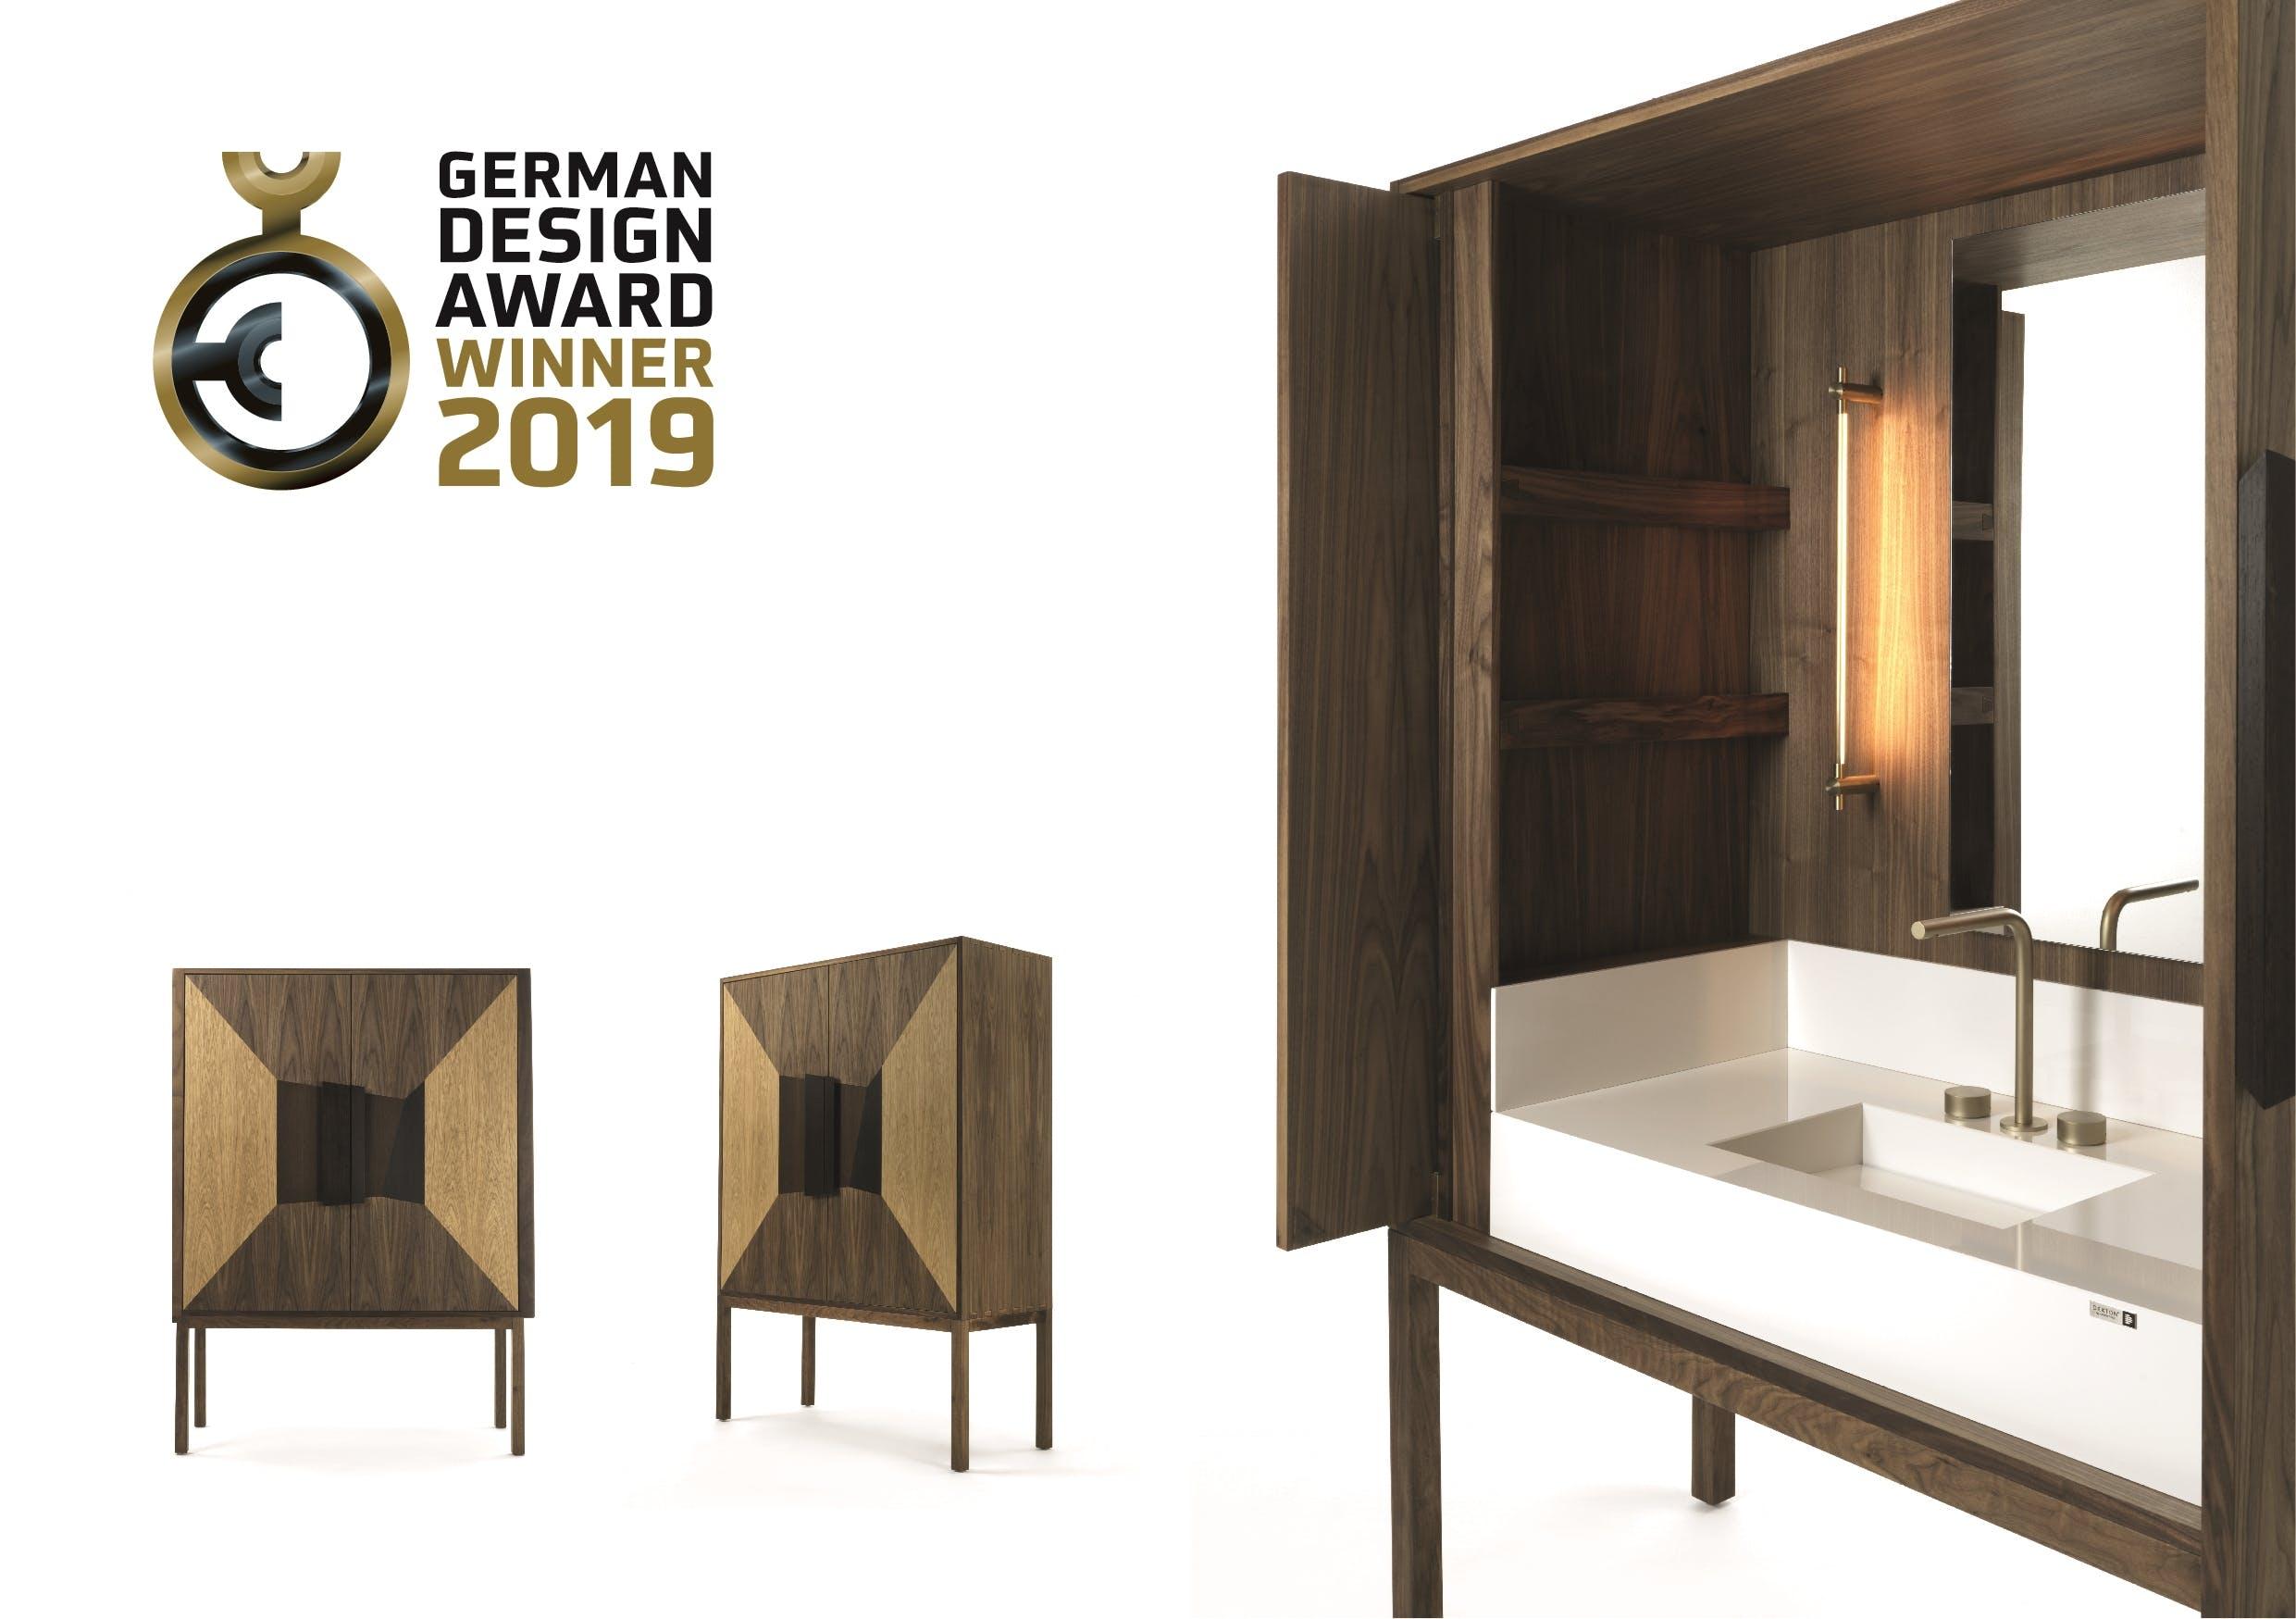 Image of Dekauri German Design Award 2019 1 in DeKauri, German Design Award 2019 - Cosentino